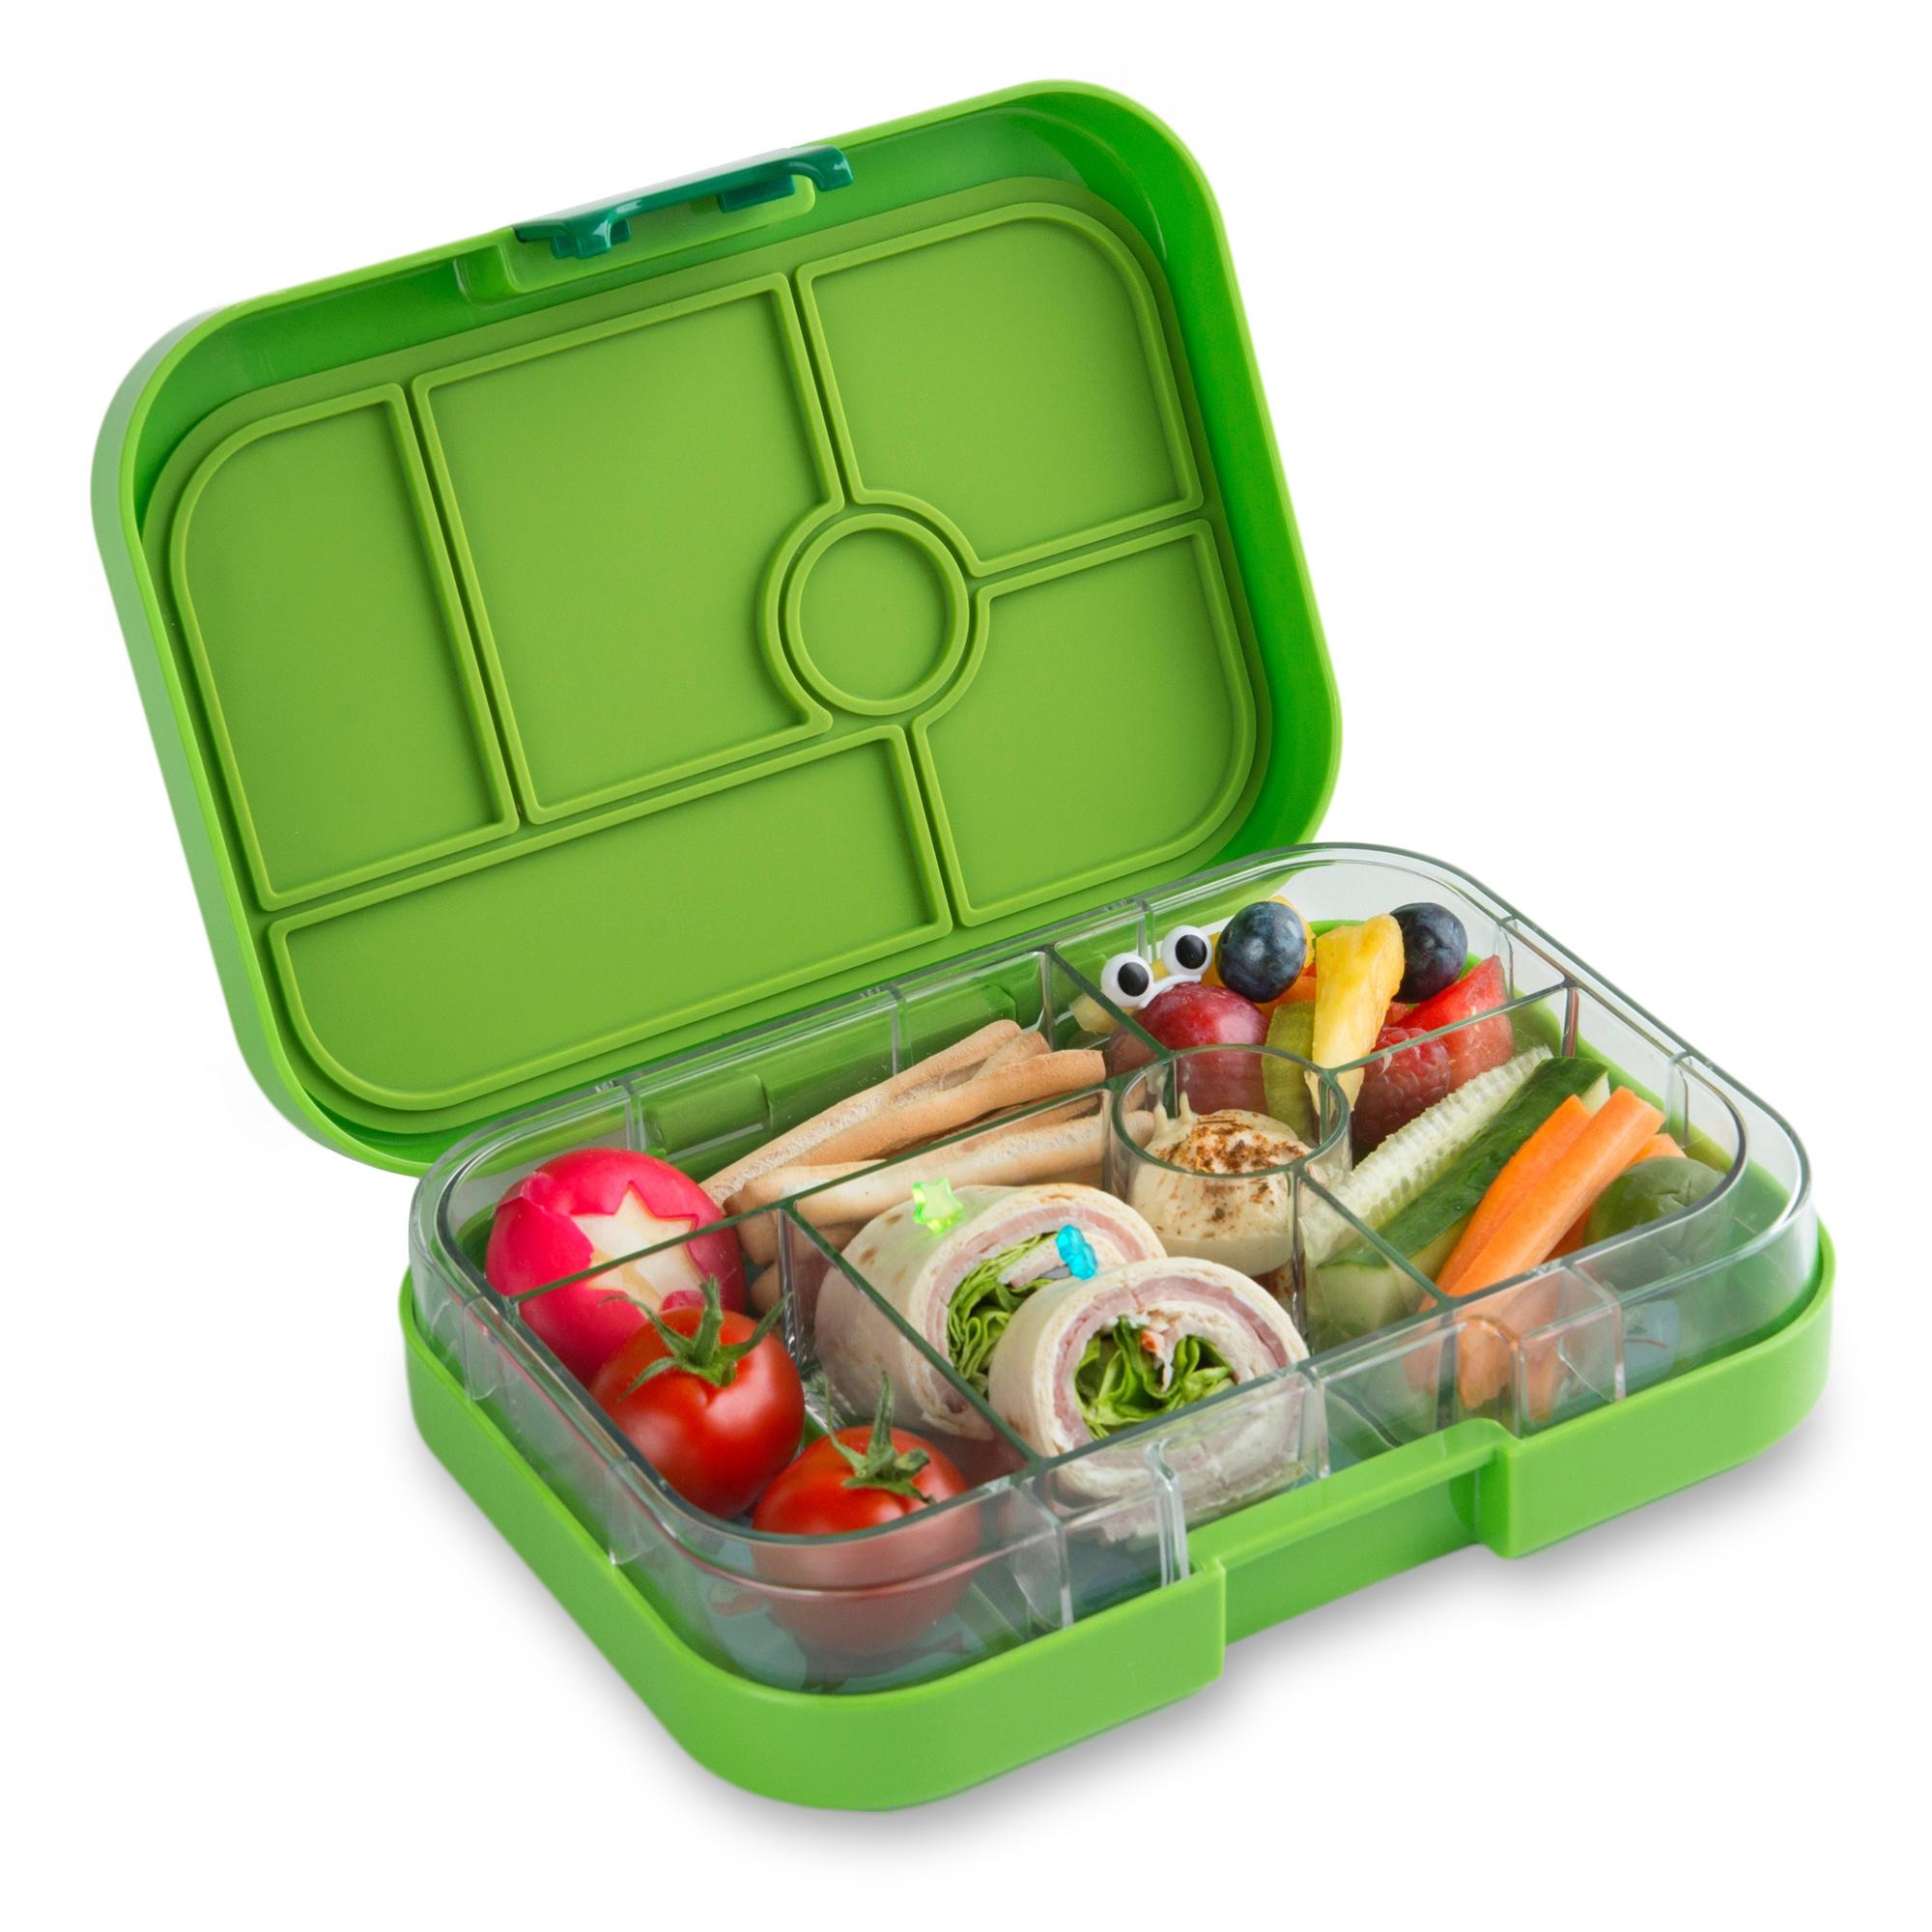 Yumbox Original broodtrommel 6 vakken Avocado groen / Kite tray-3